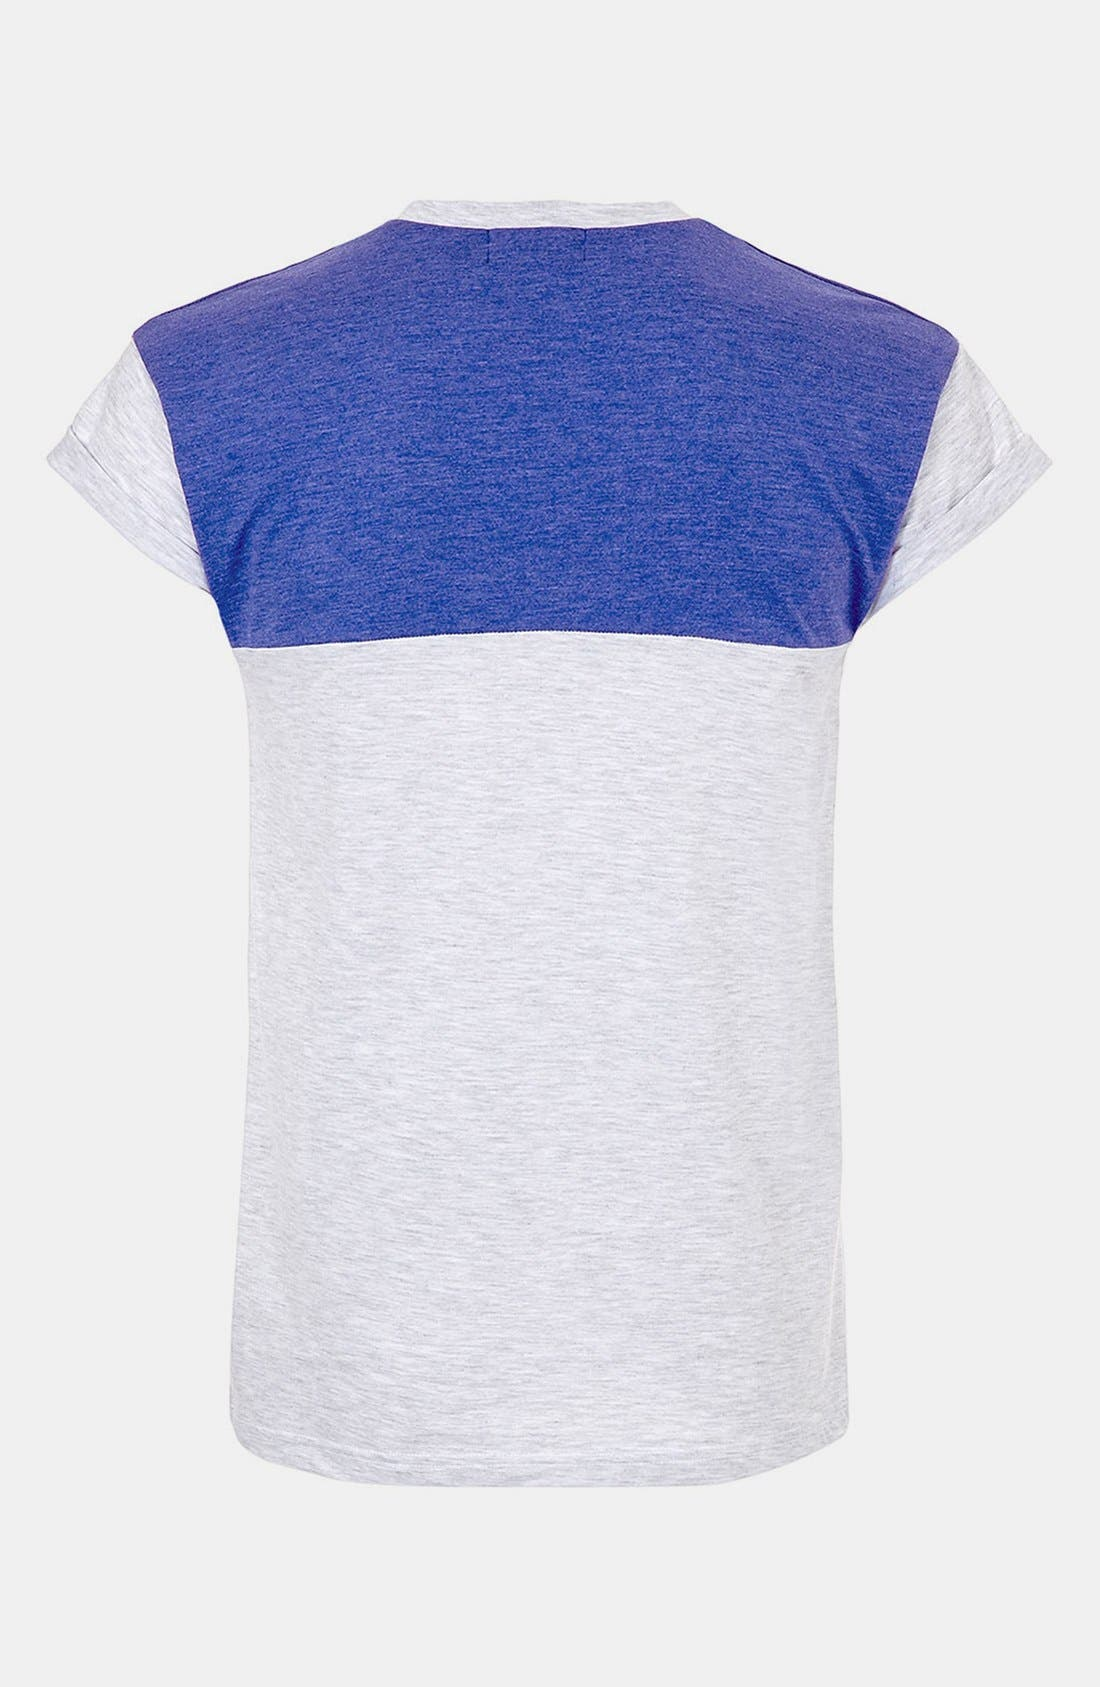 Alternate Image 2  - Topman 'Cut & Sew' T-Shirt